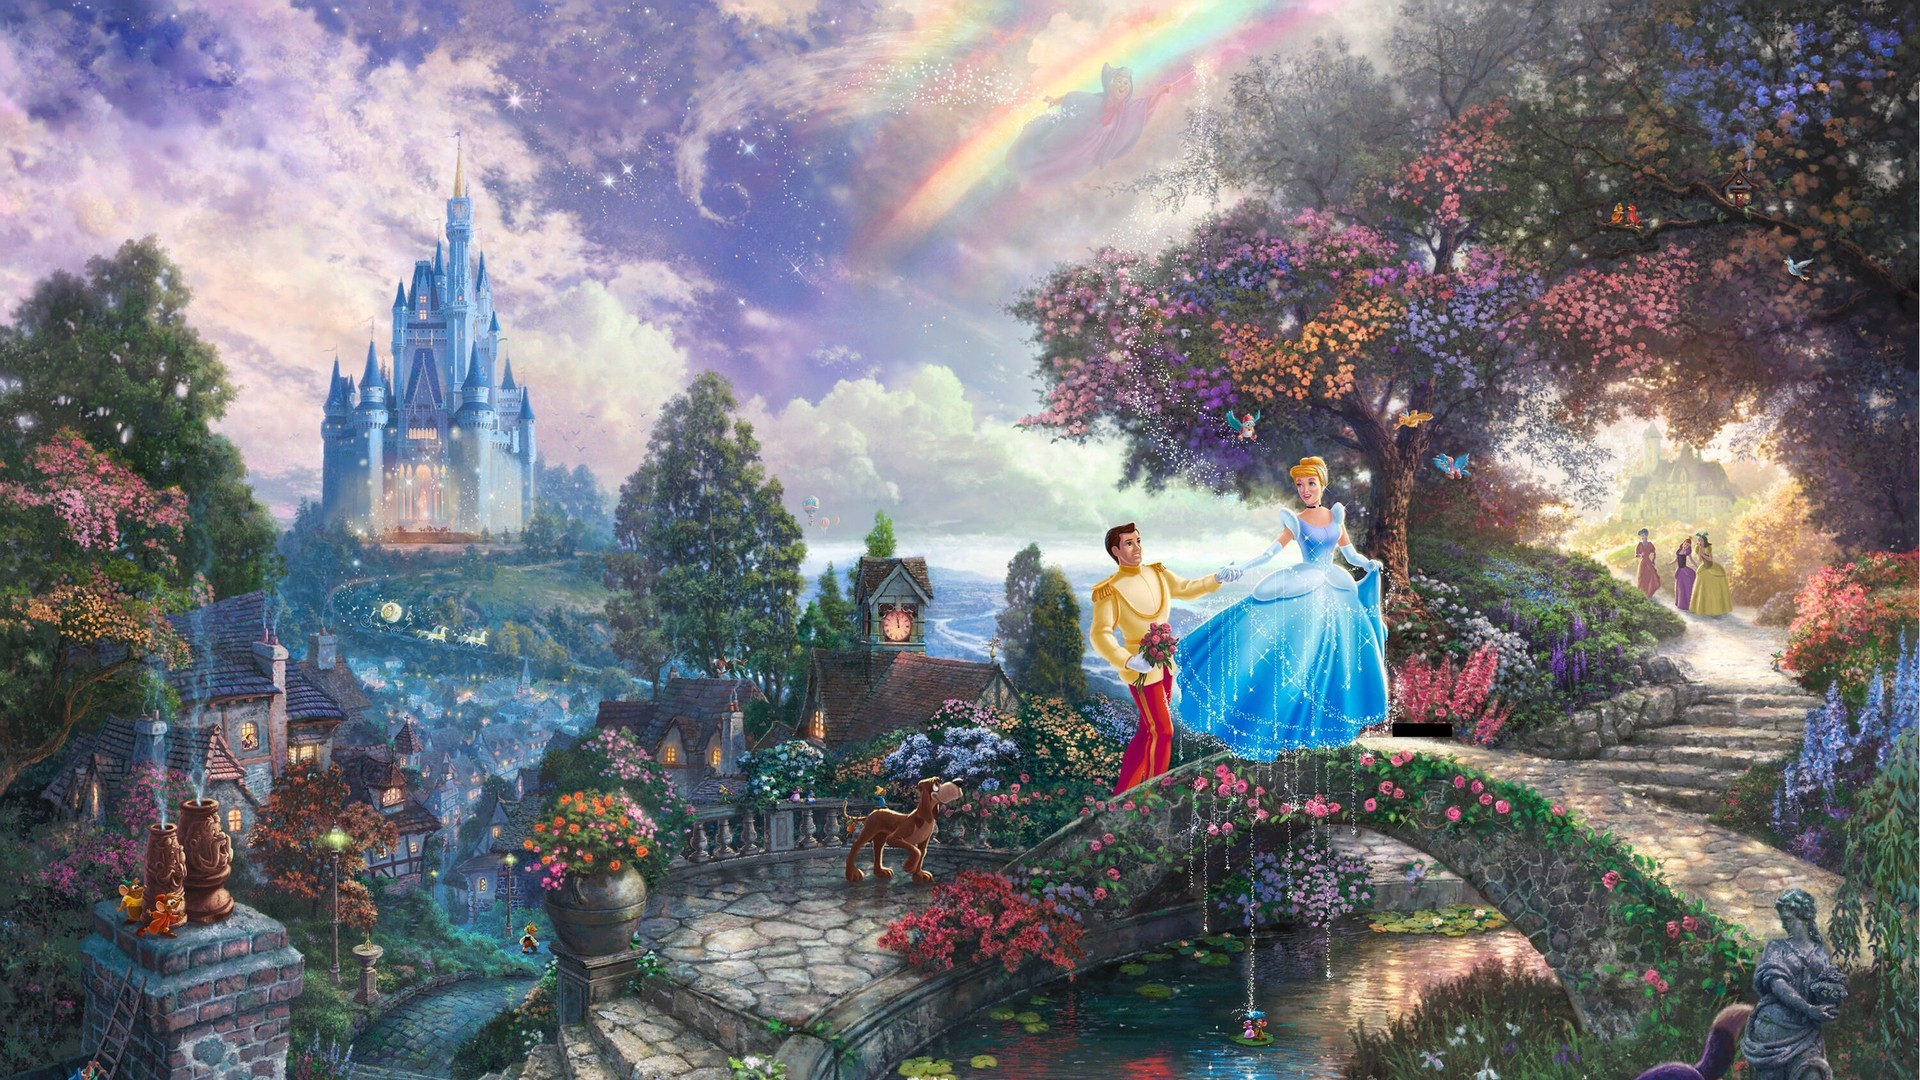 Top Wallpaper Macbook Disney - 1019241-cool-disney-hd-wallpaper-1920x1080  Photograph_30812.jpg